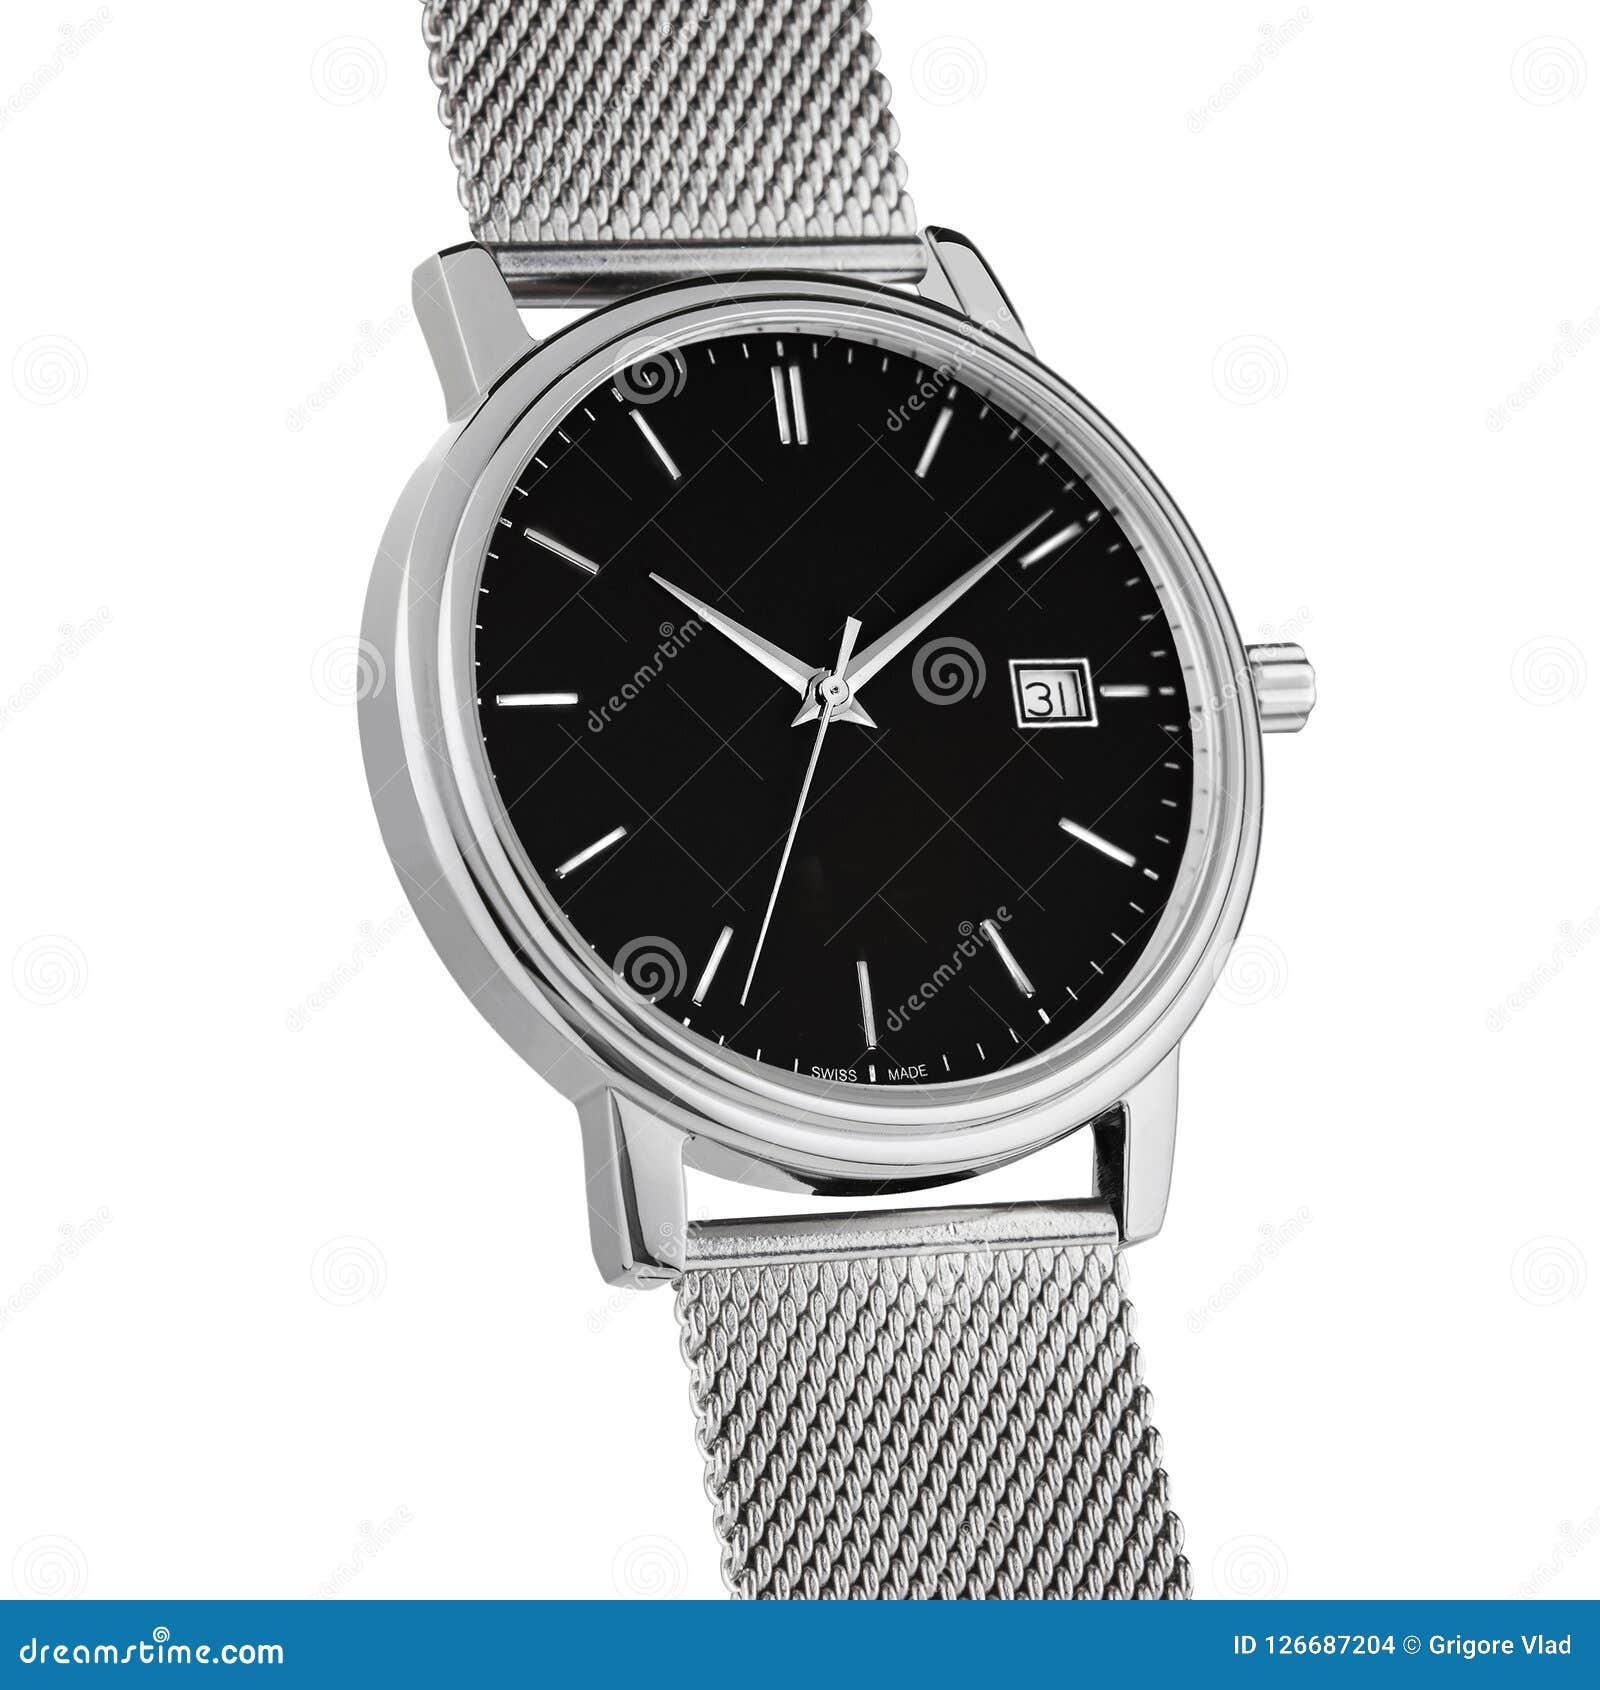 Reloj de la mano en un fondo blanco